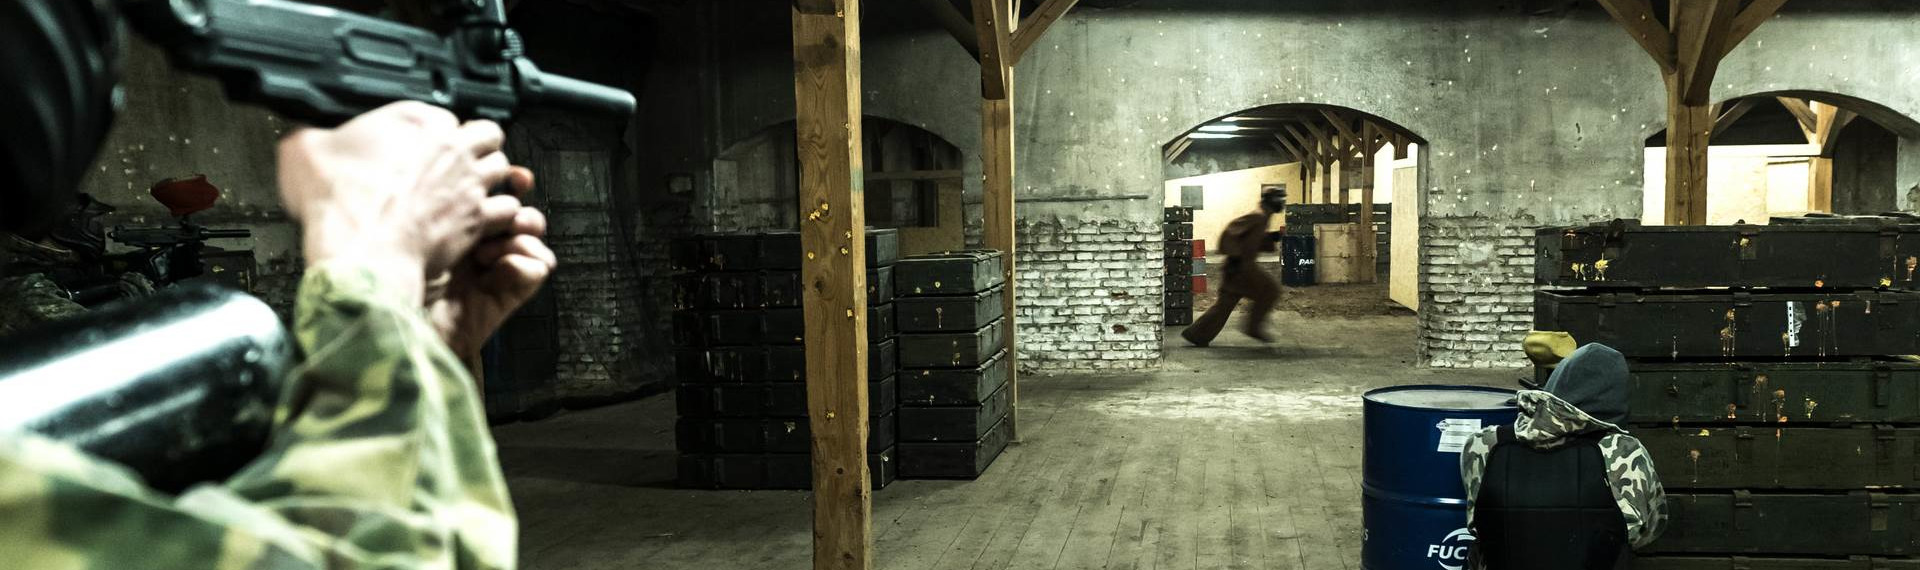 Prag Indoor-Paintball image